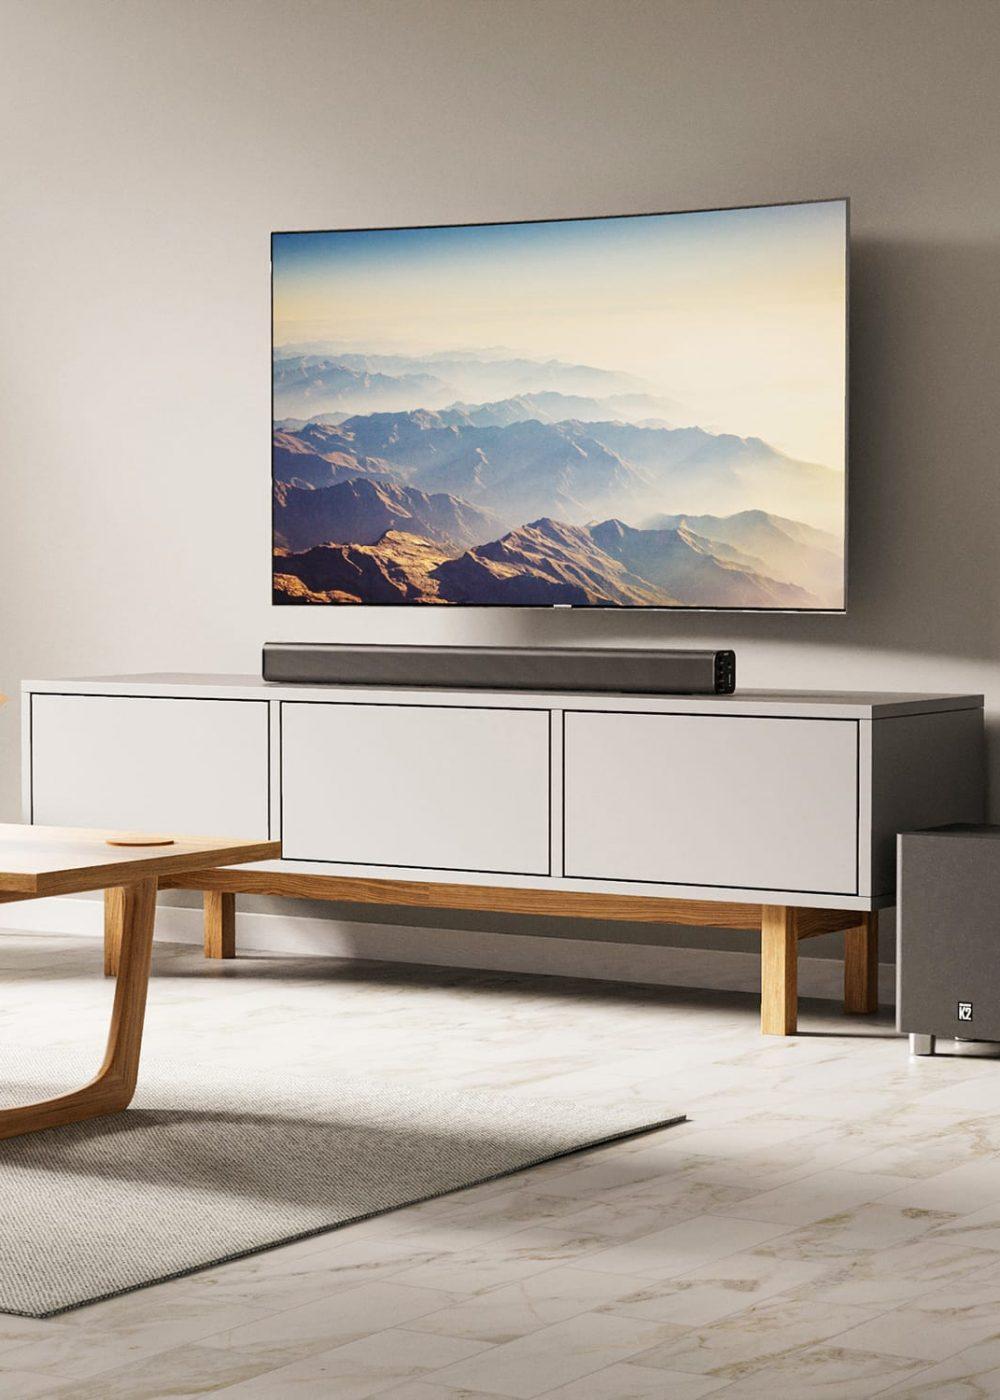 Majority K2 Bluetooth Soundbar Subwoofer Living Room Lifestyle Black